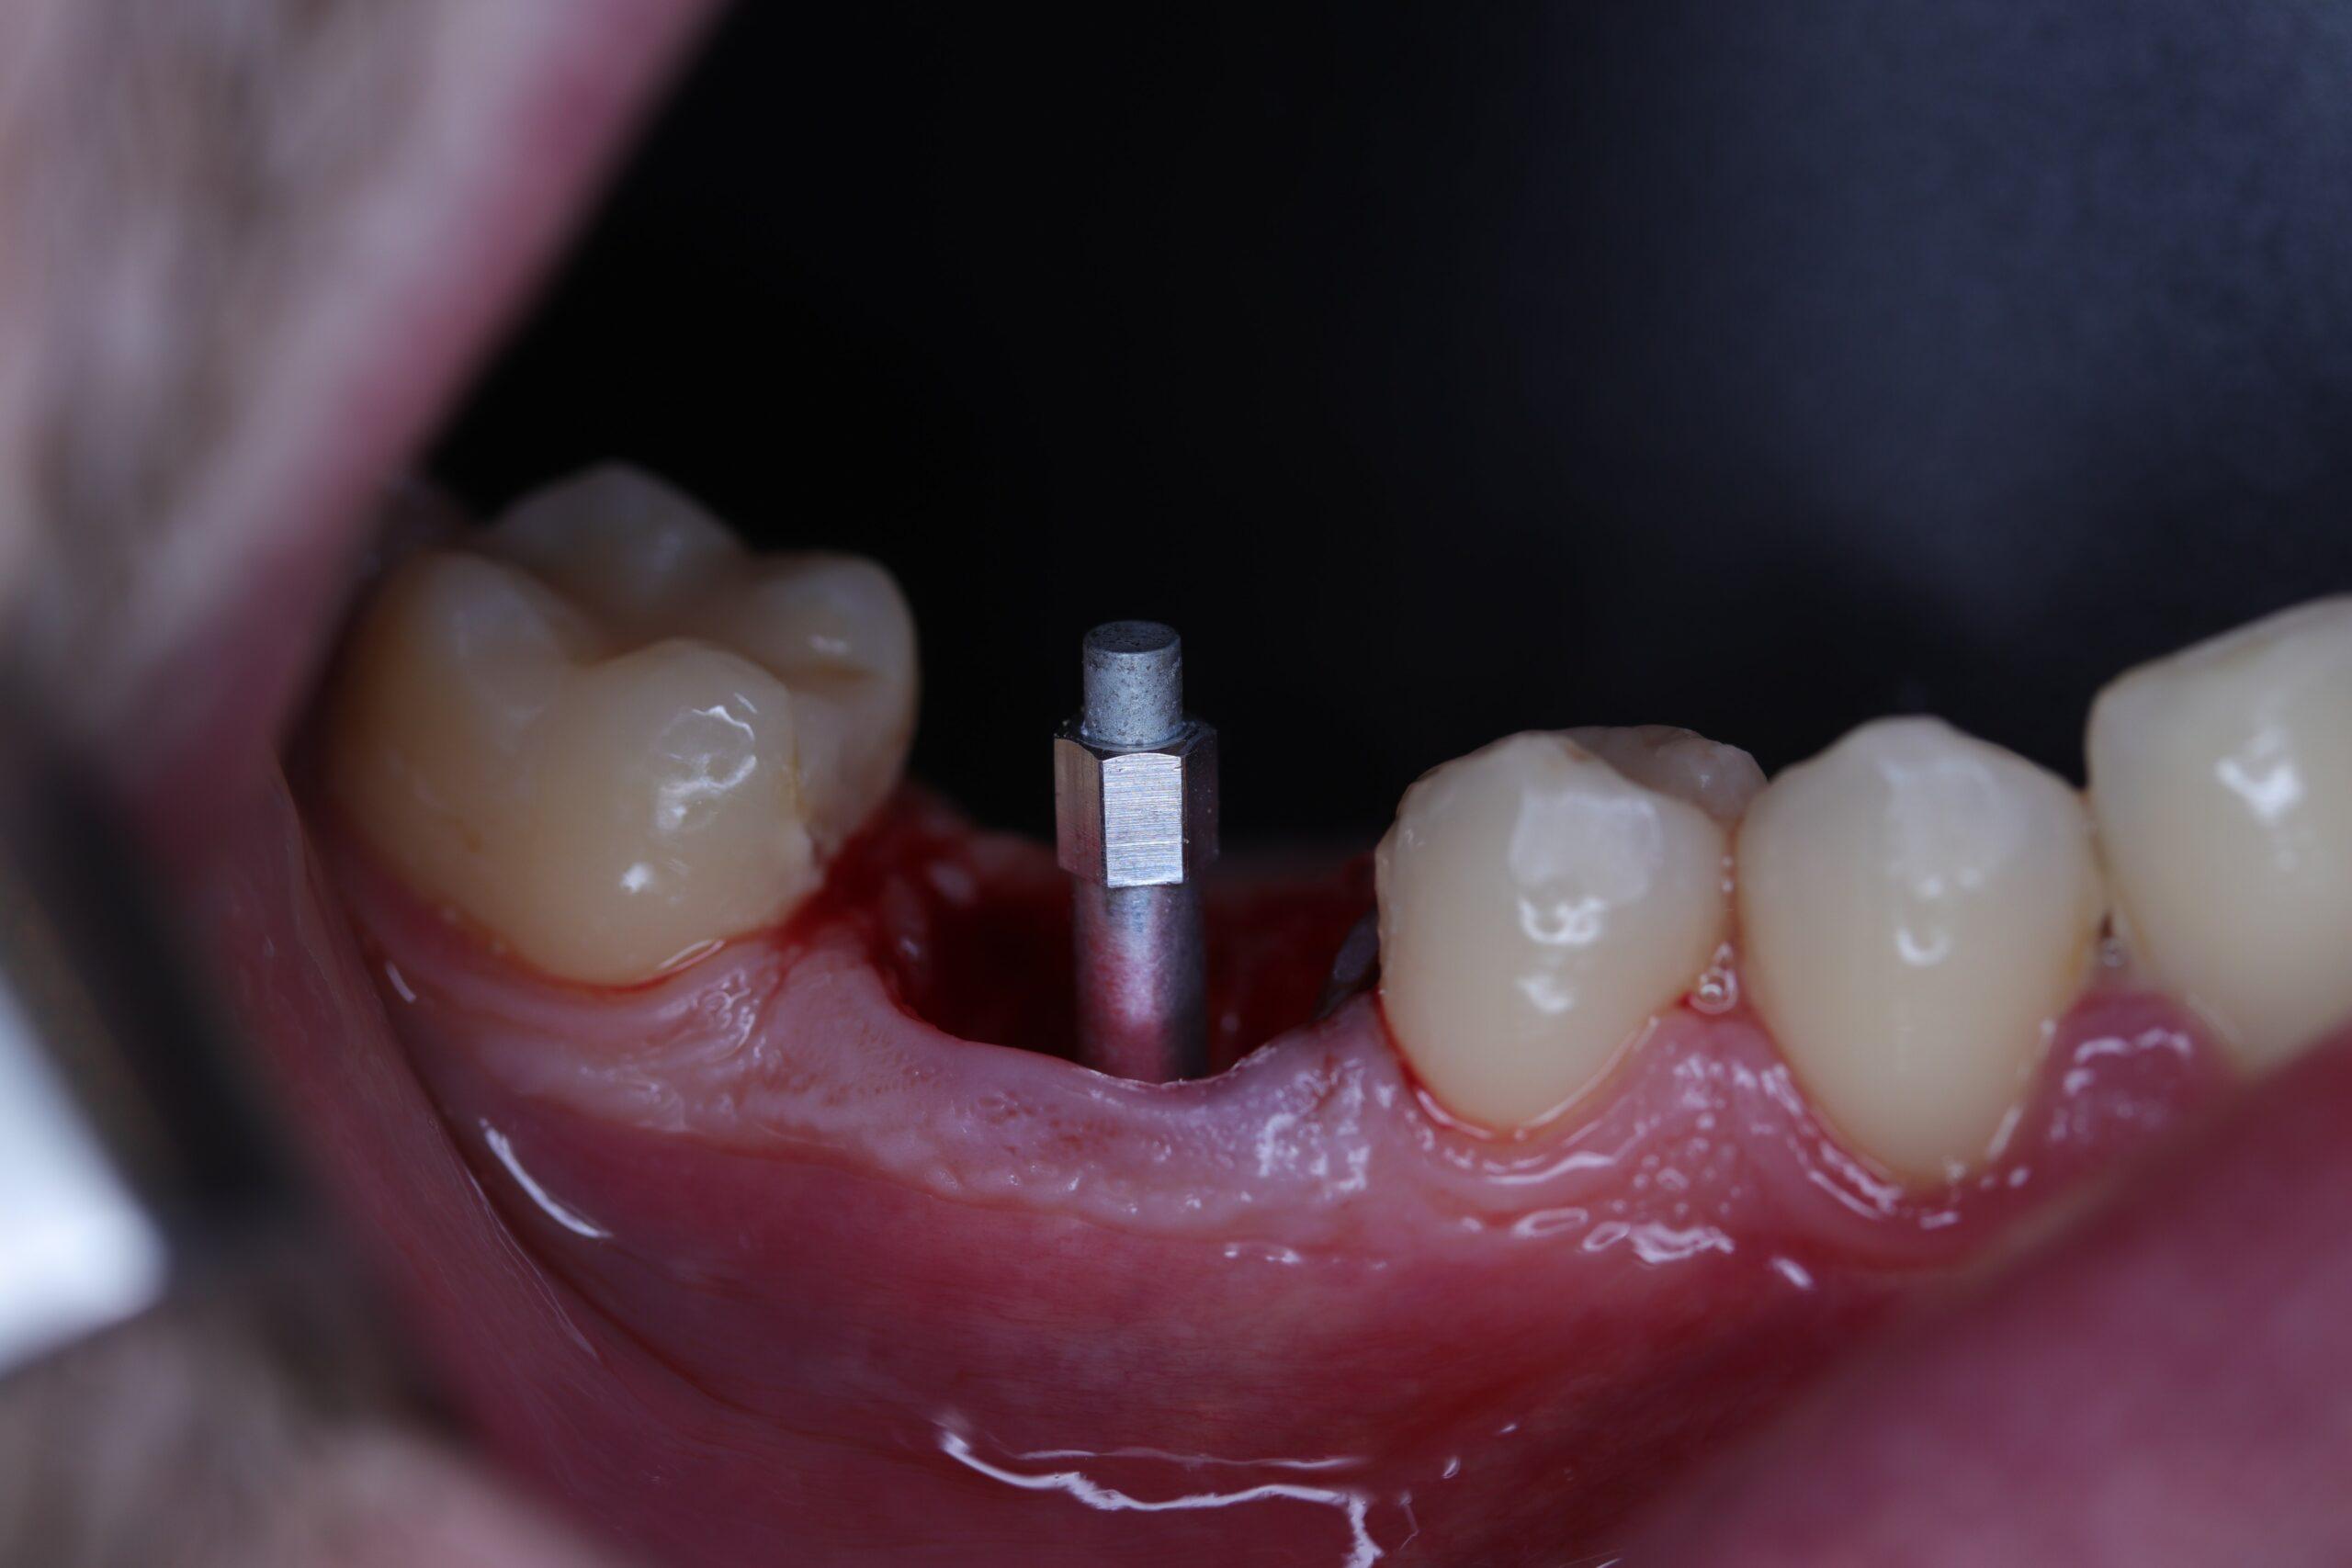 Figure 4 Smart-peg (Type 16) screwed to the implant platform